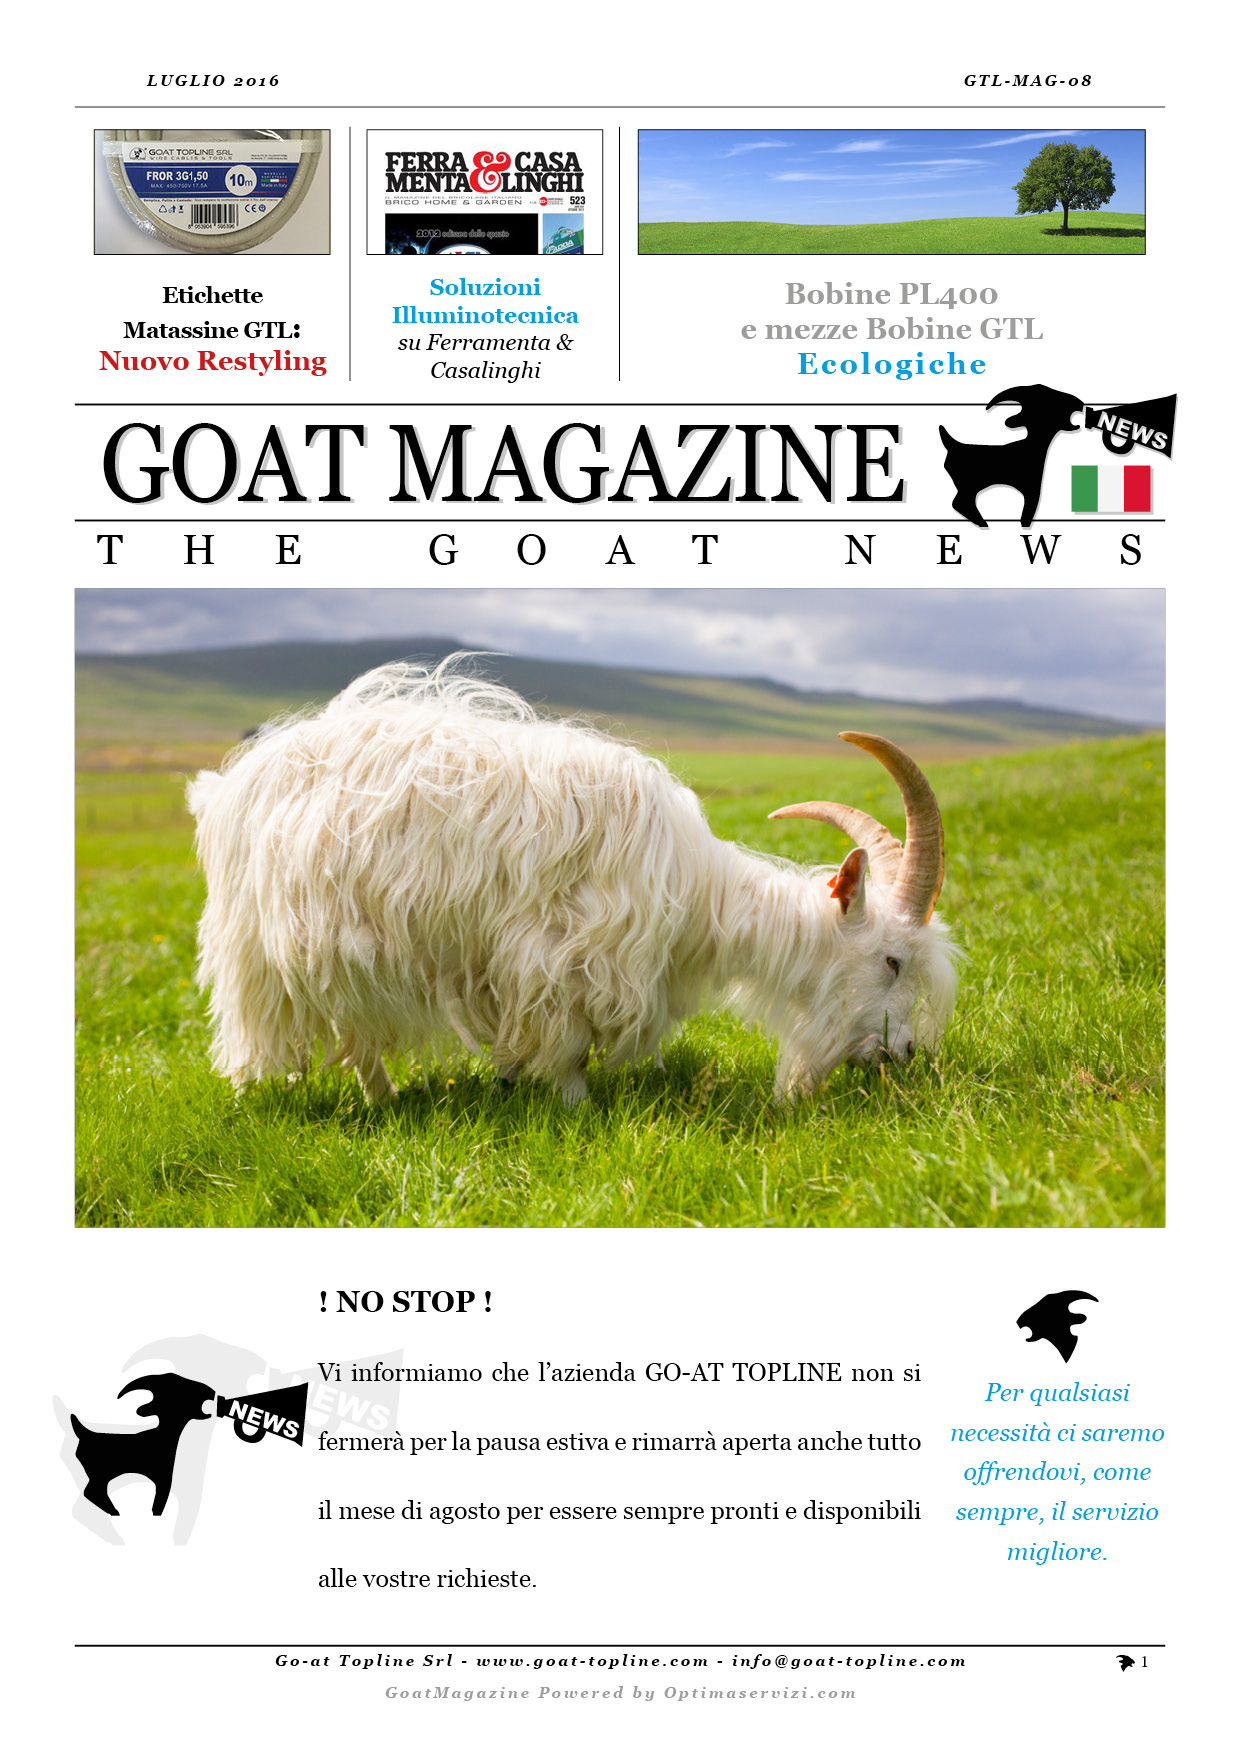 GTL-MAG08 -PUBBLICO- Luglio 2016 - ITA